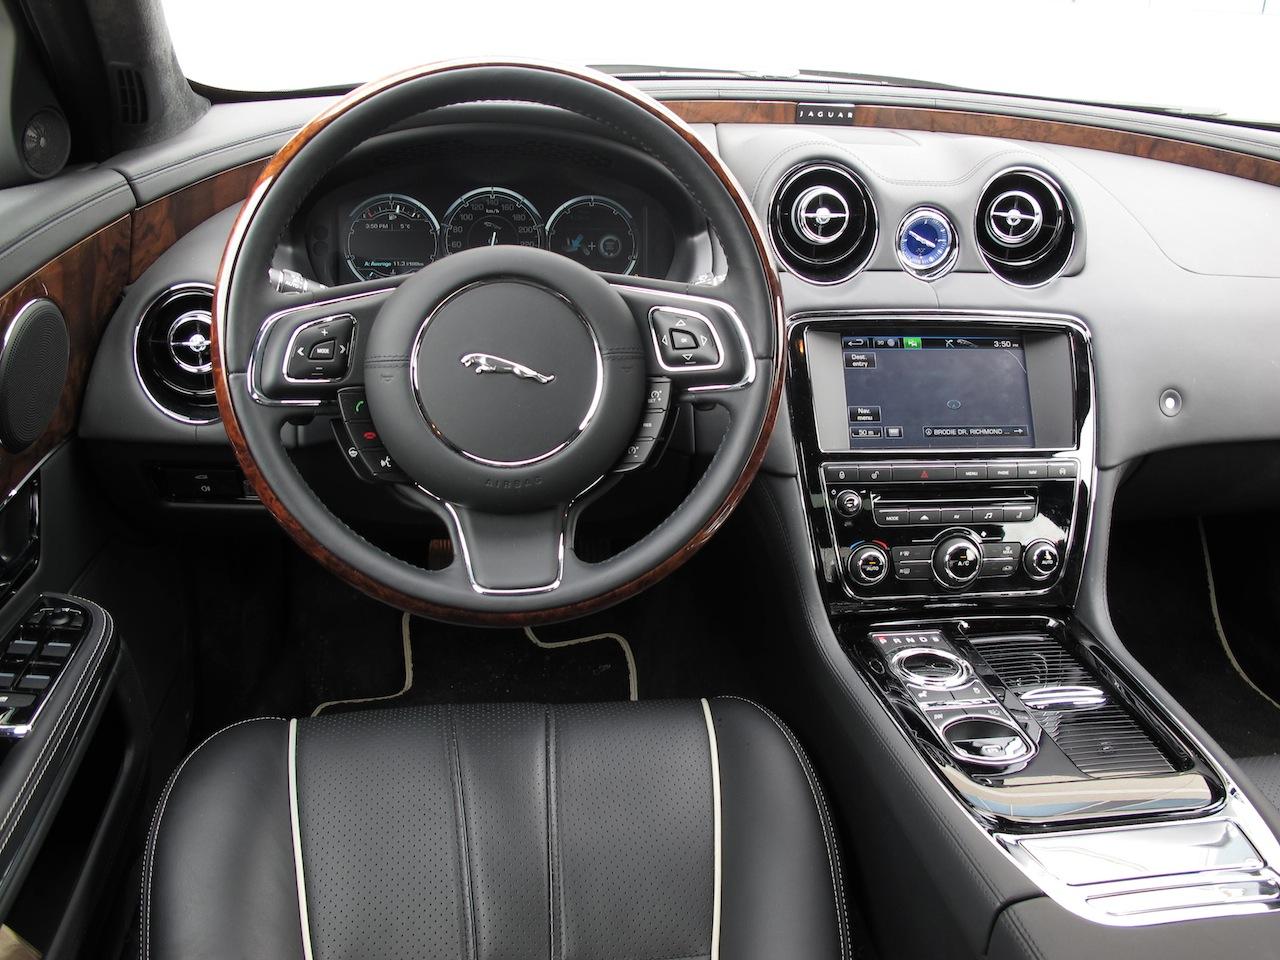 Pirelli P Zero Nero >> 2013 積架 Jaguar XJ AWD Review - Cars, Photos, Test Drives ...